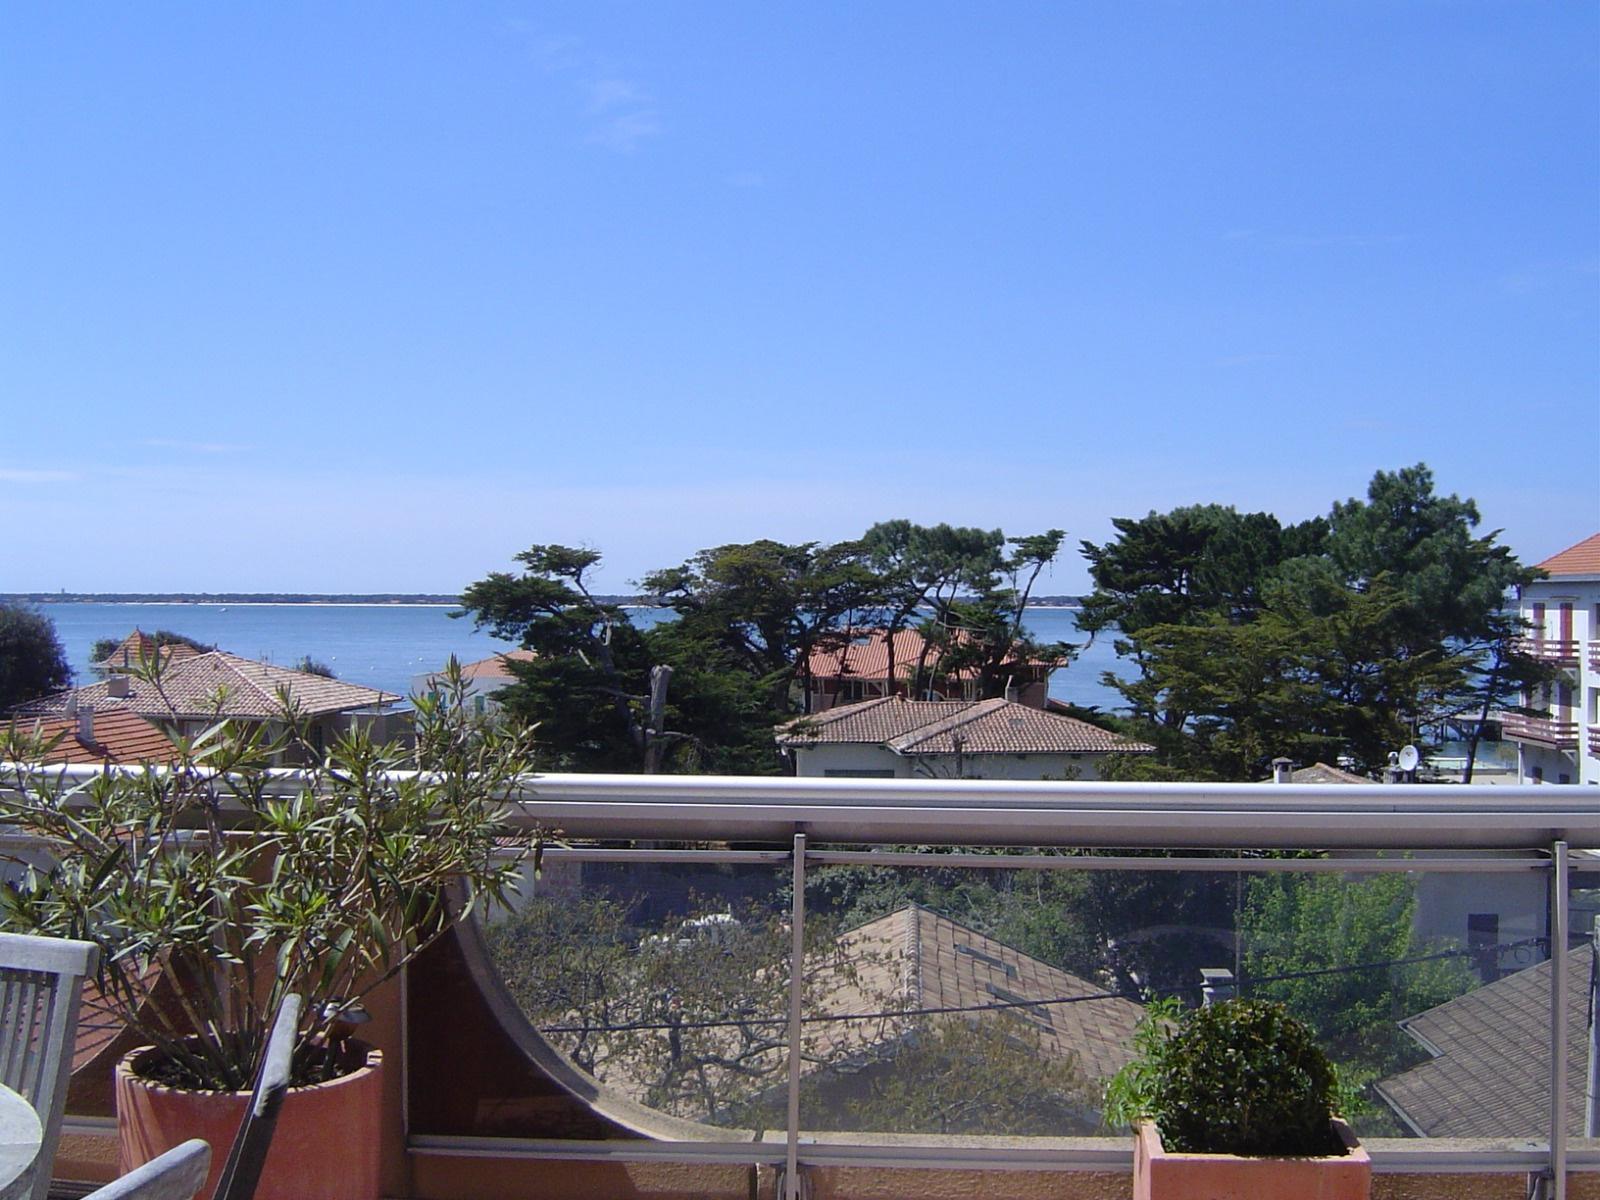 Location de vacances Appartement  ()